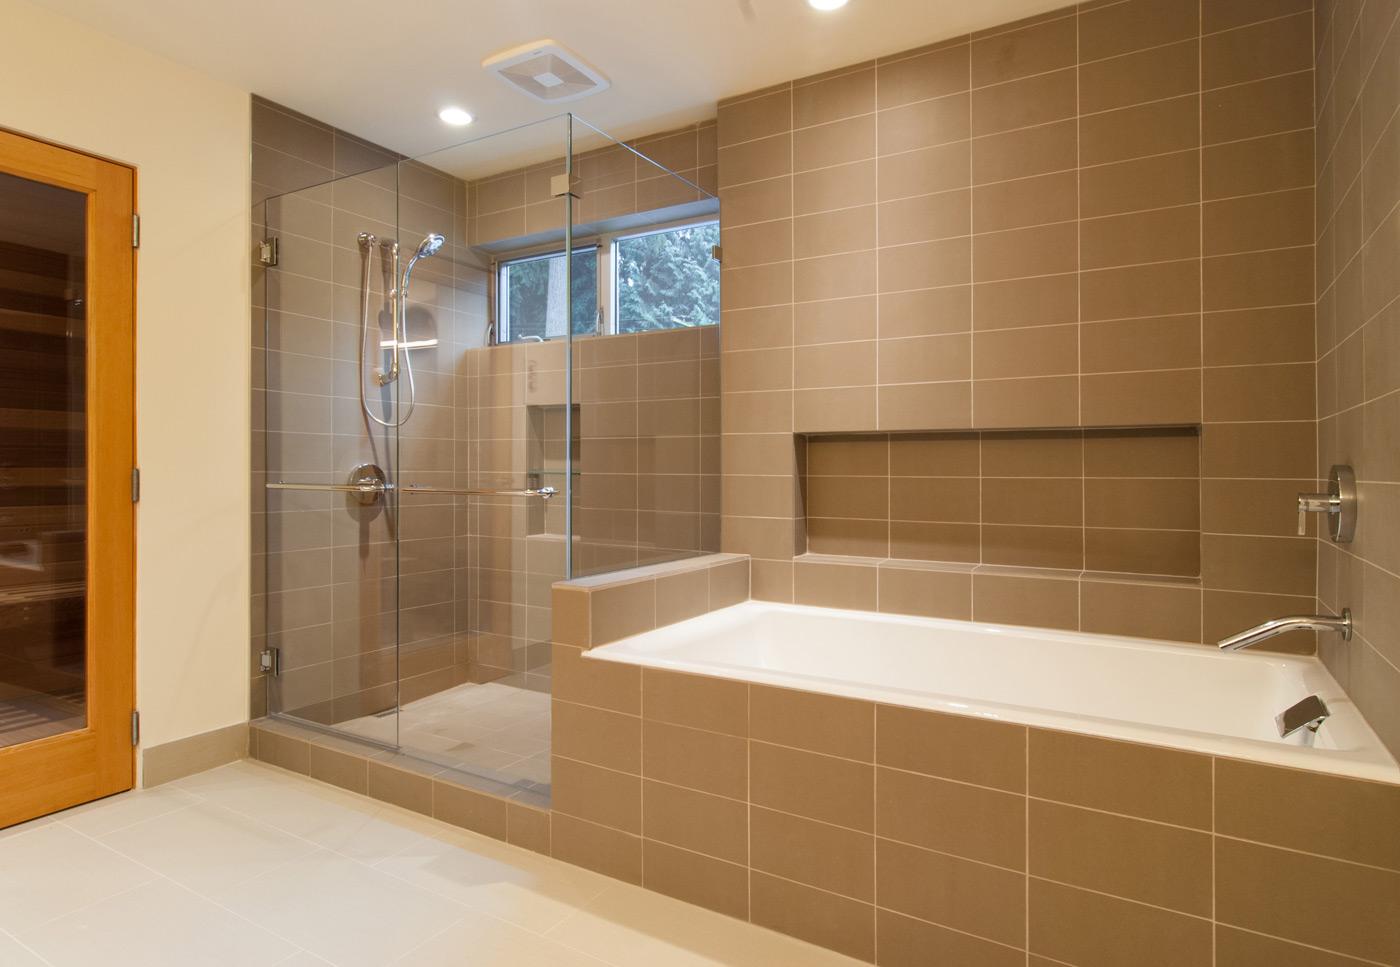 Bathroom Tile Ideas for a More Stylish Design